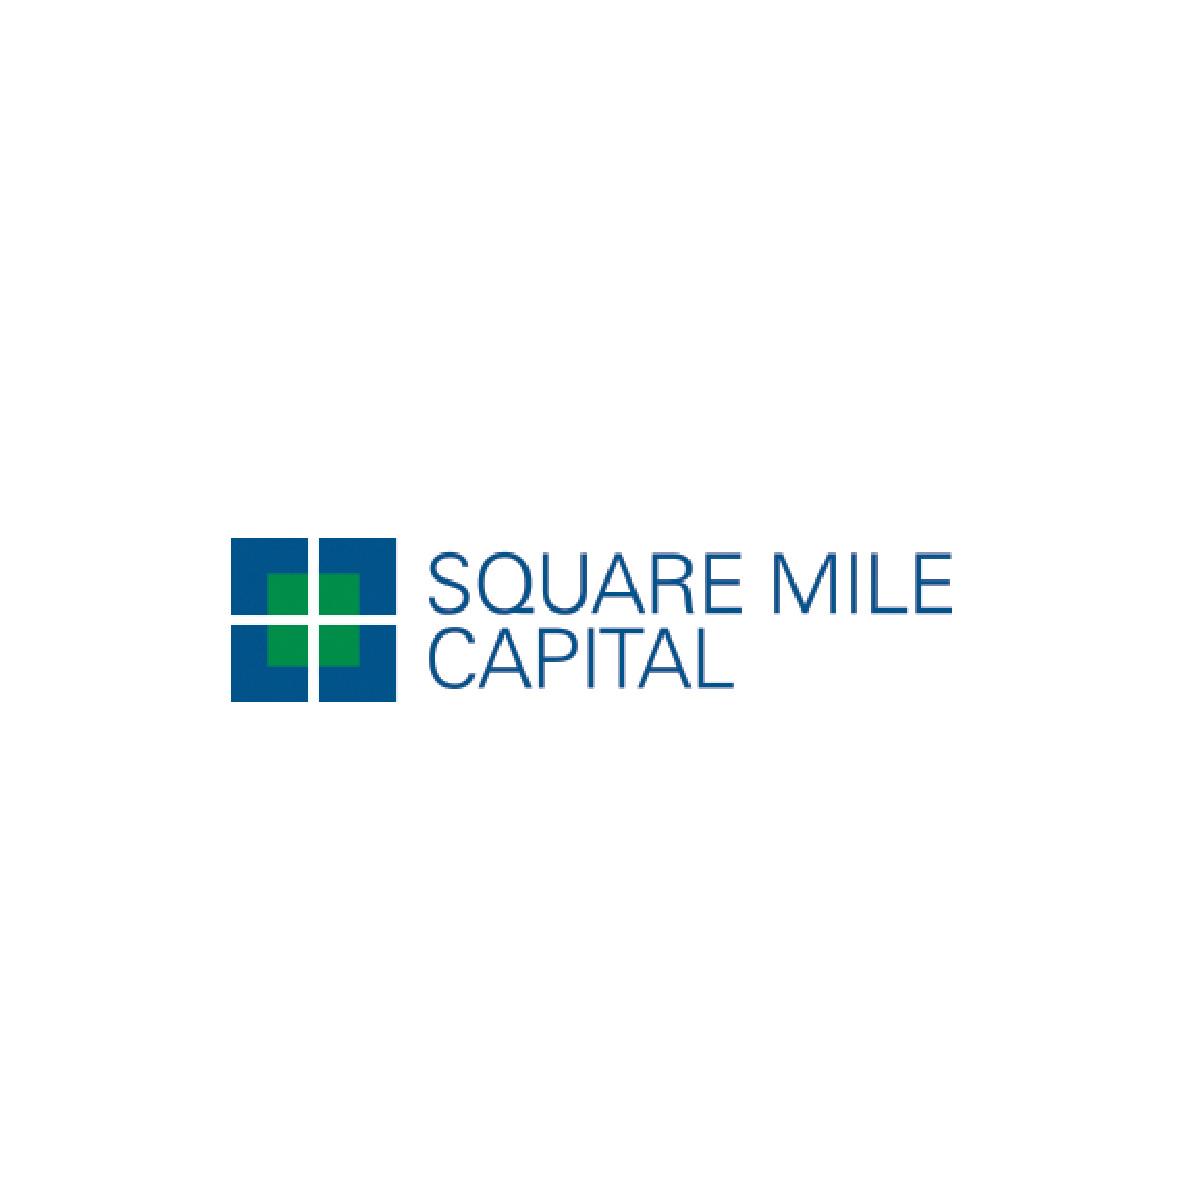 Square Mile Capital